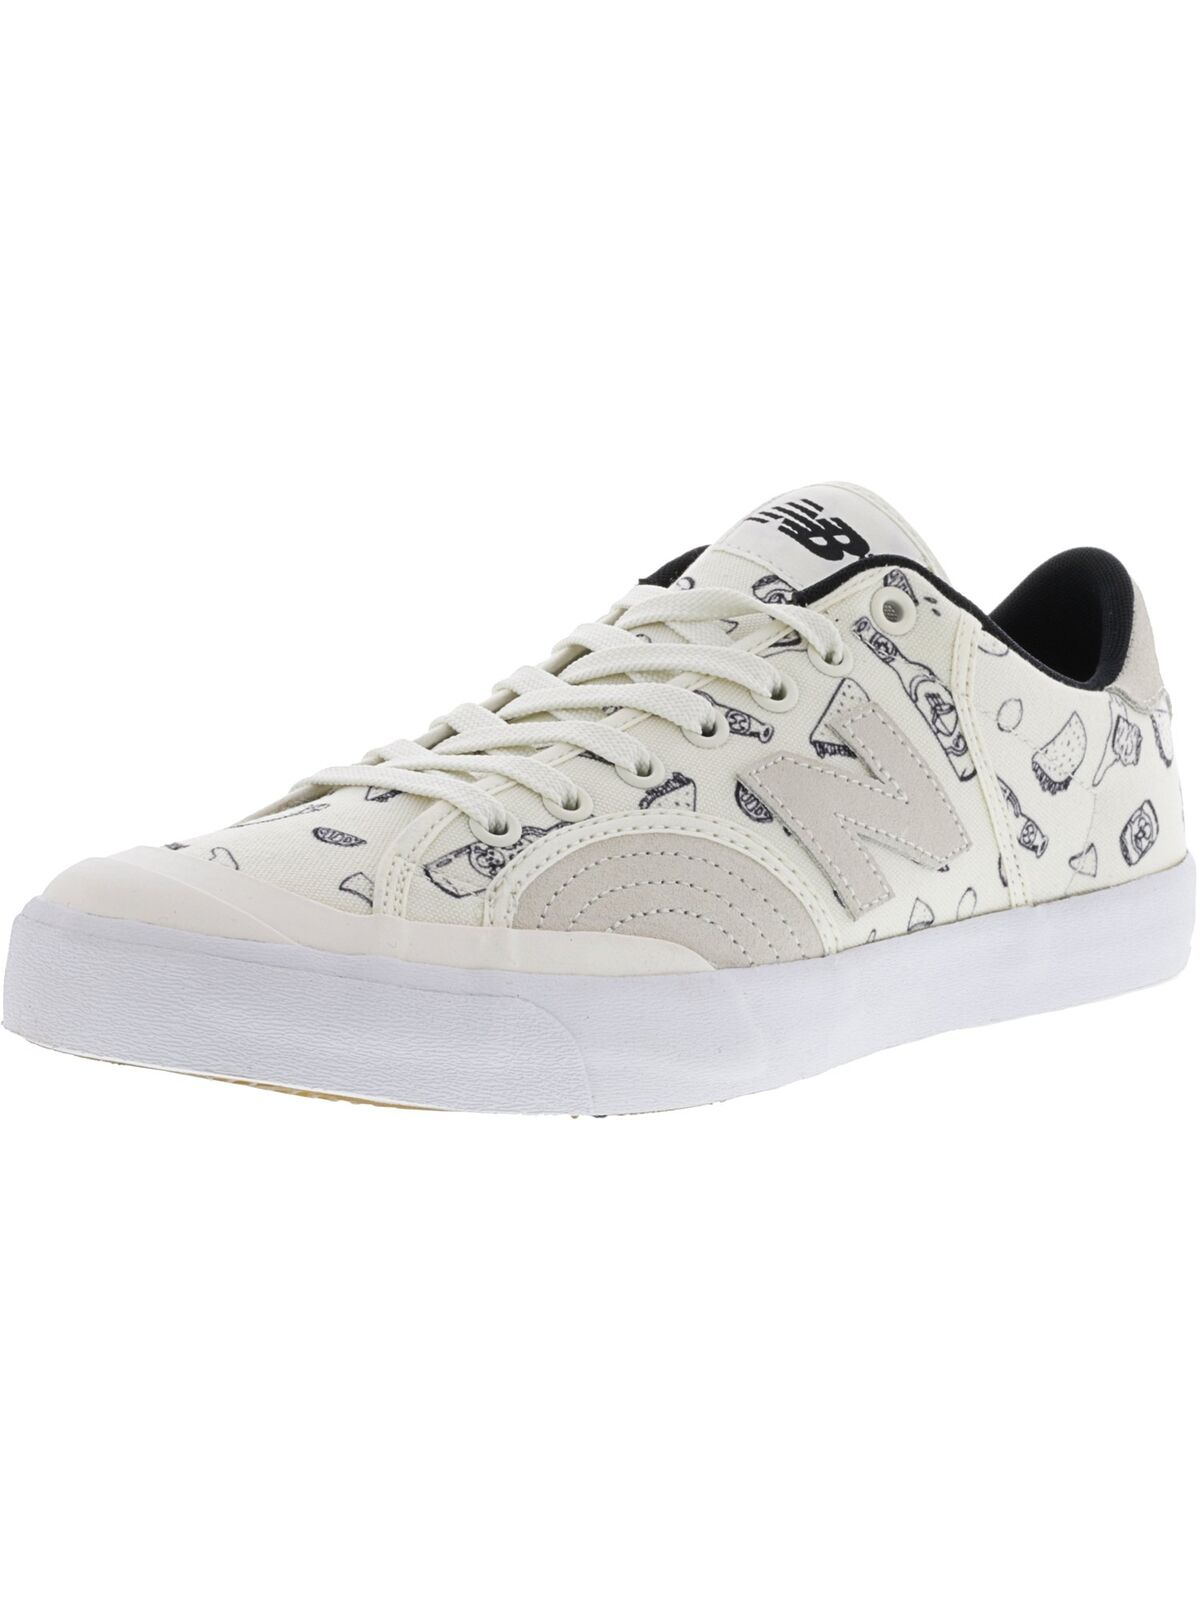 New Balance Men's Nm212 Ankle-High Canvas Fashion Sneaker